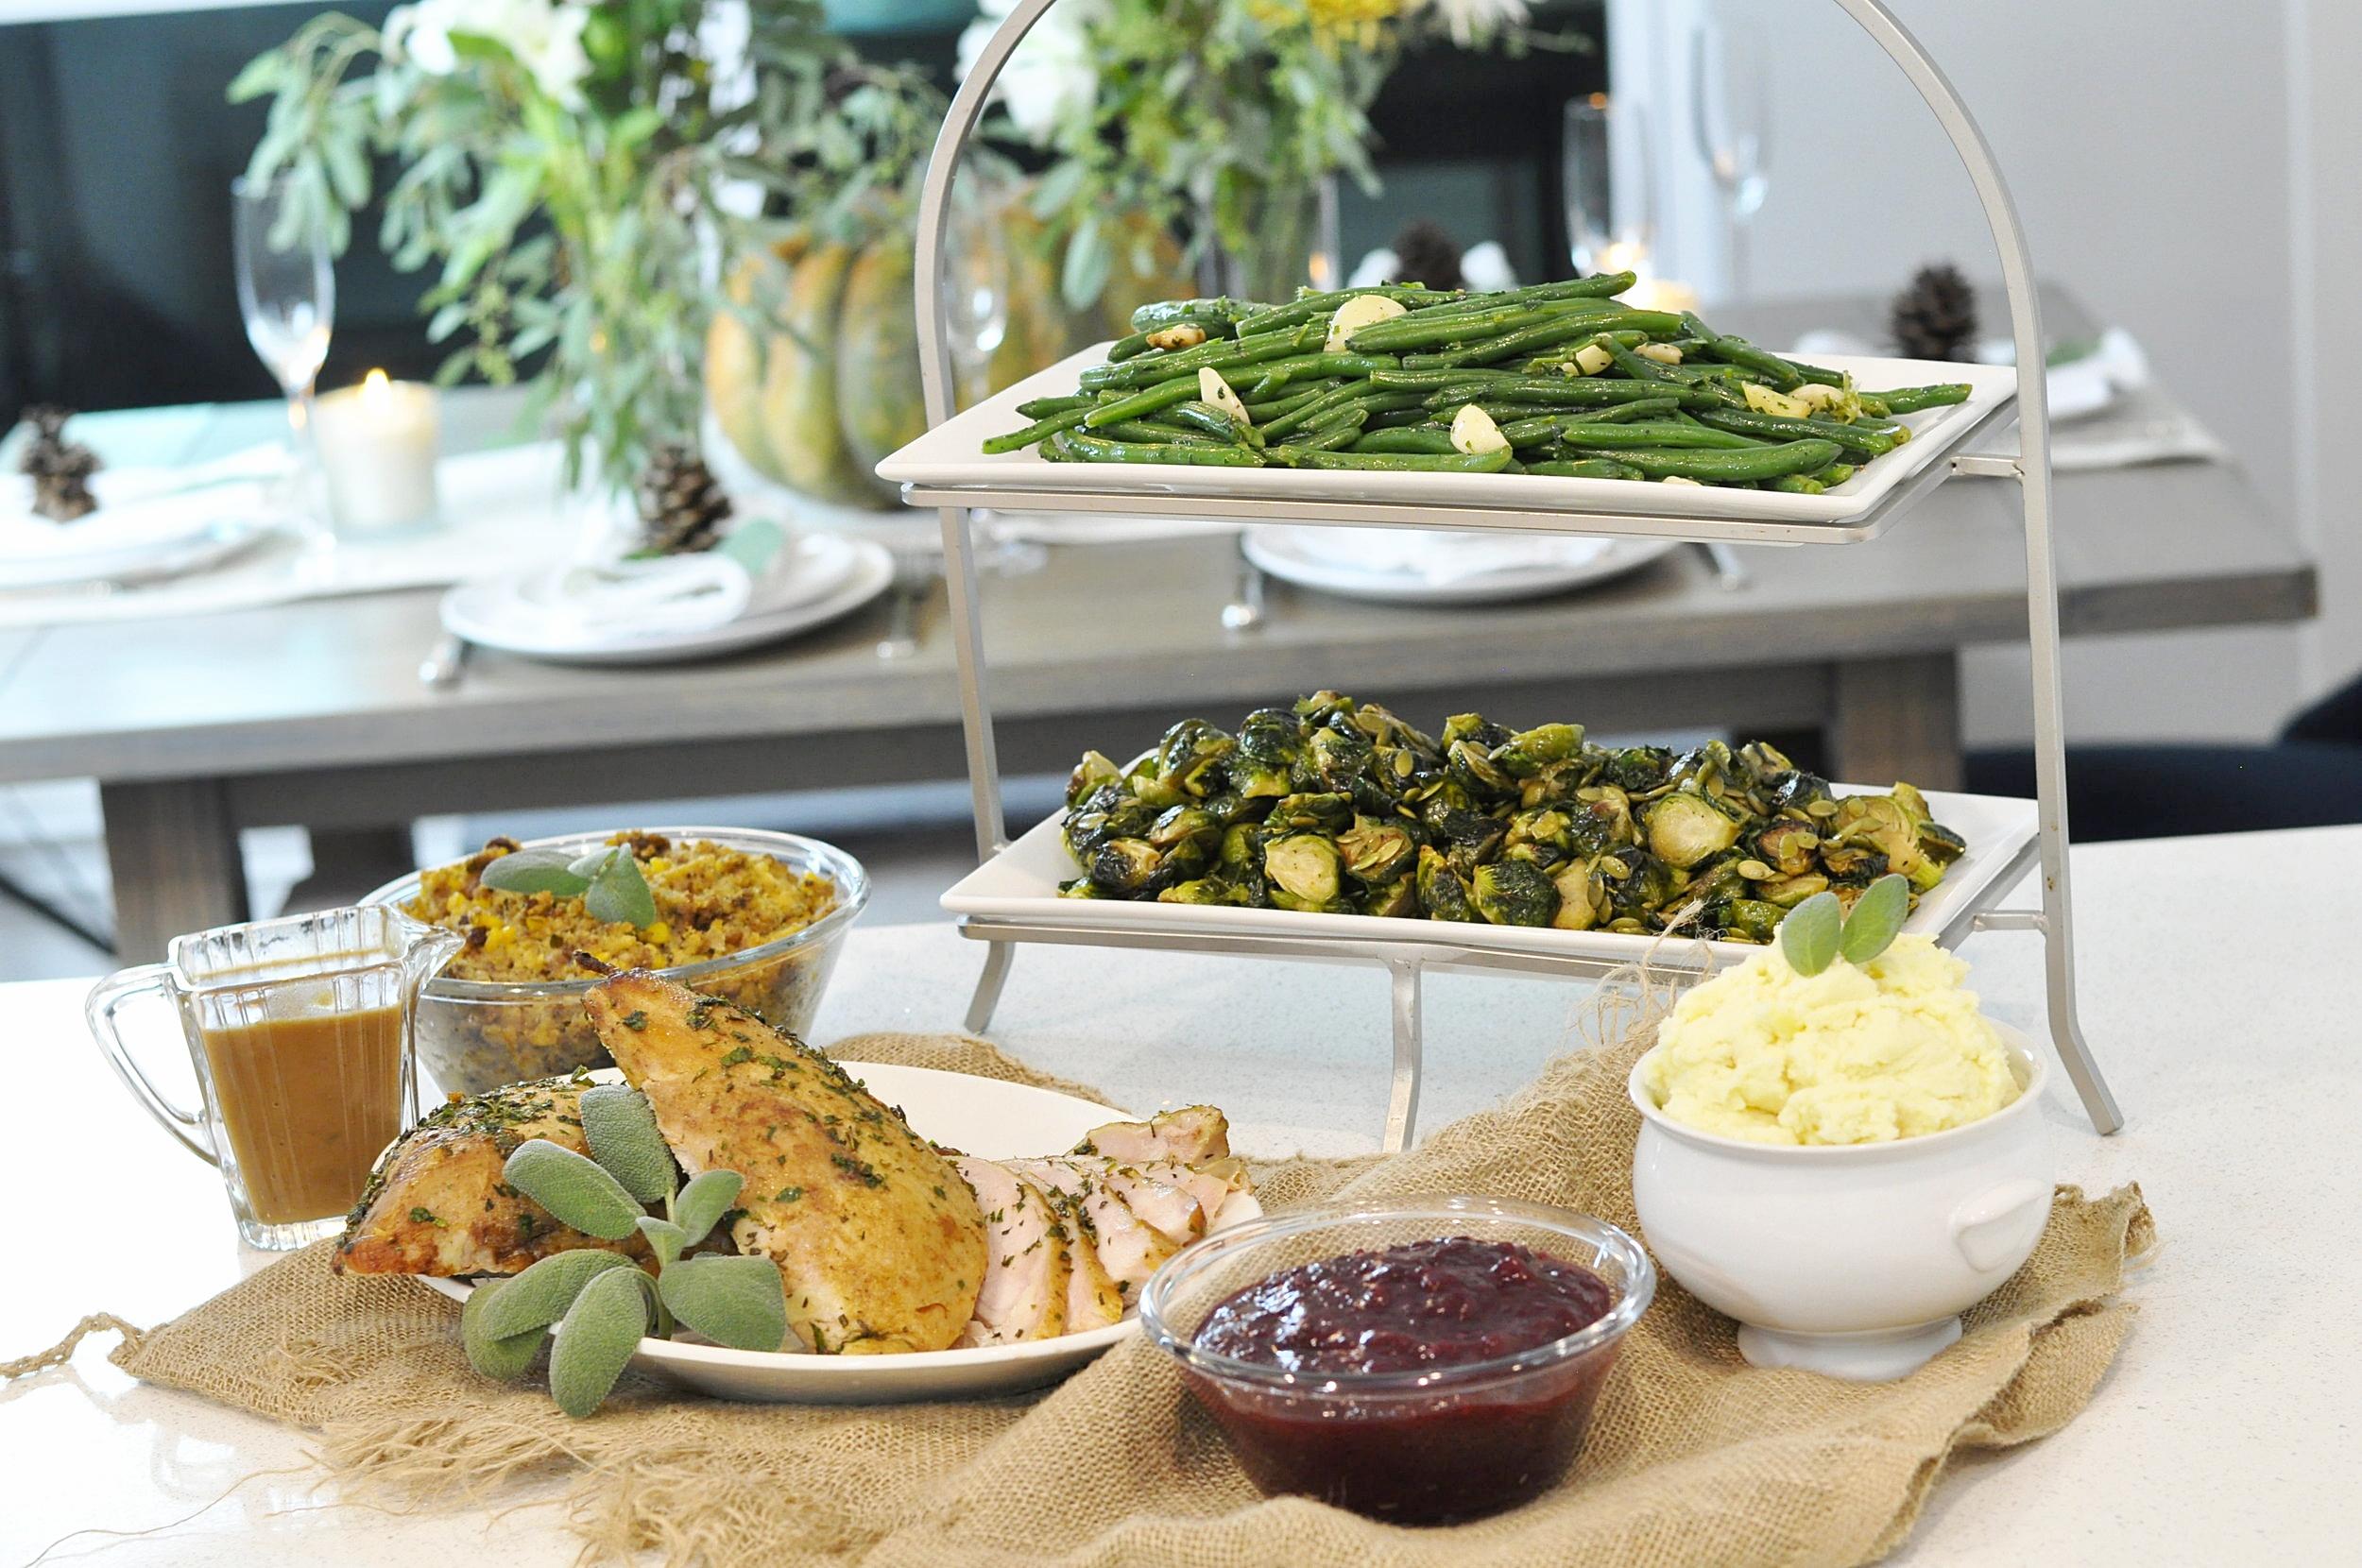 Entertaining Dinner Ideas | Three Time Saving Holiday Ideas | coupleinthekitchen,com